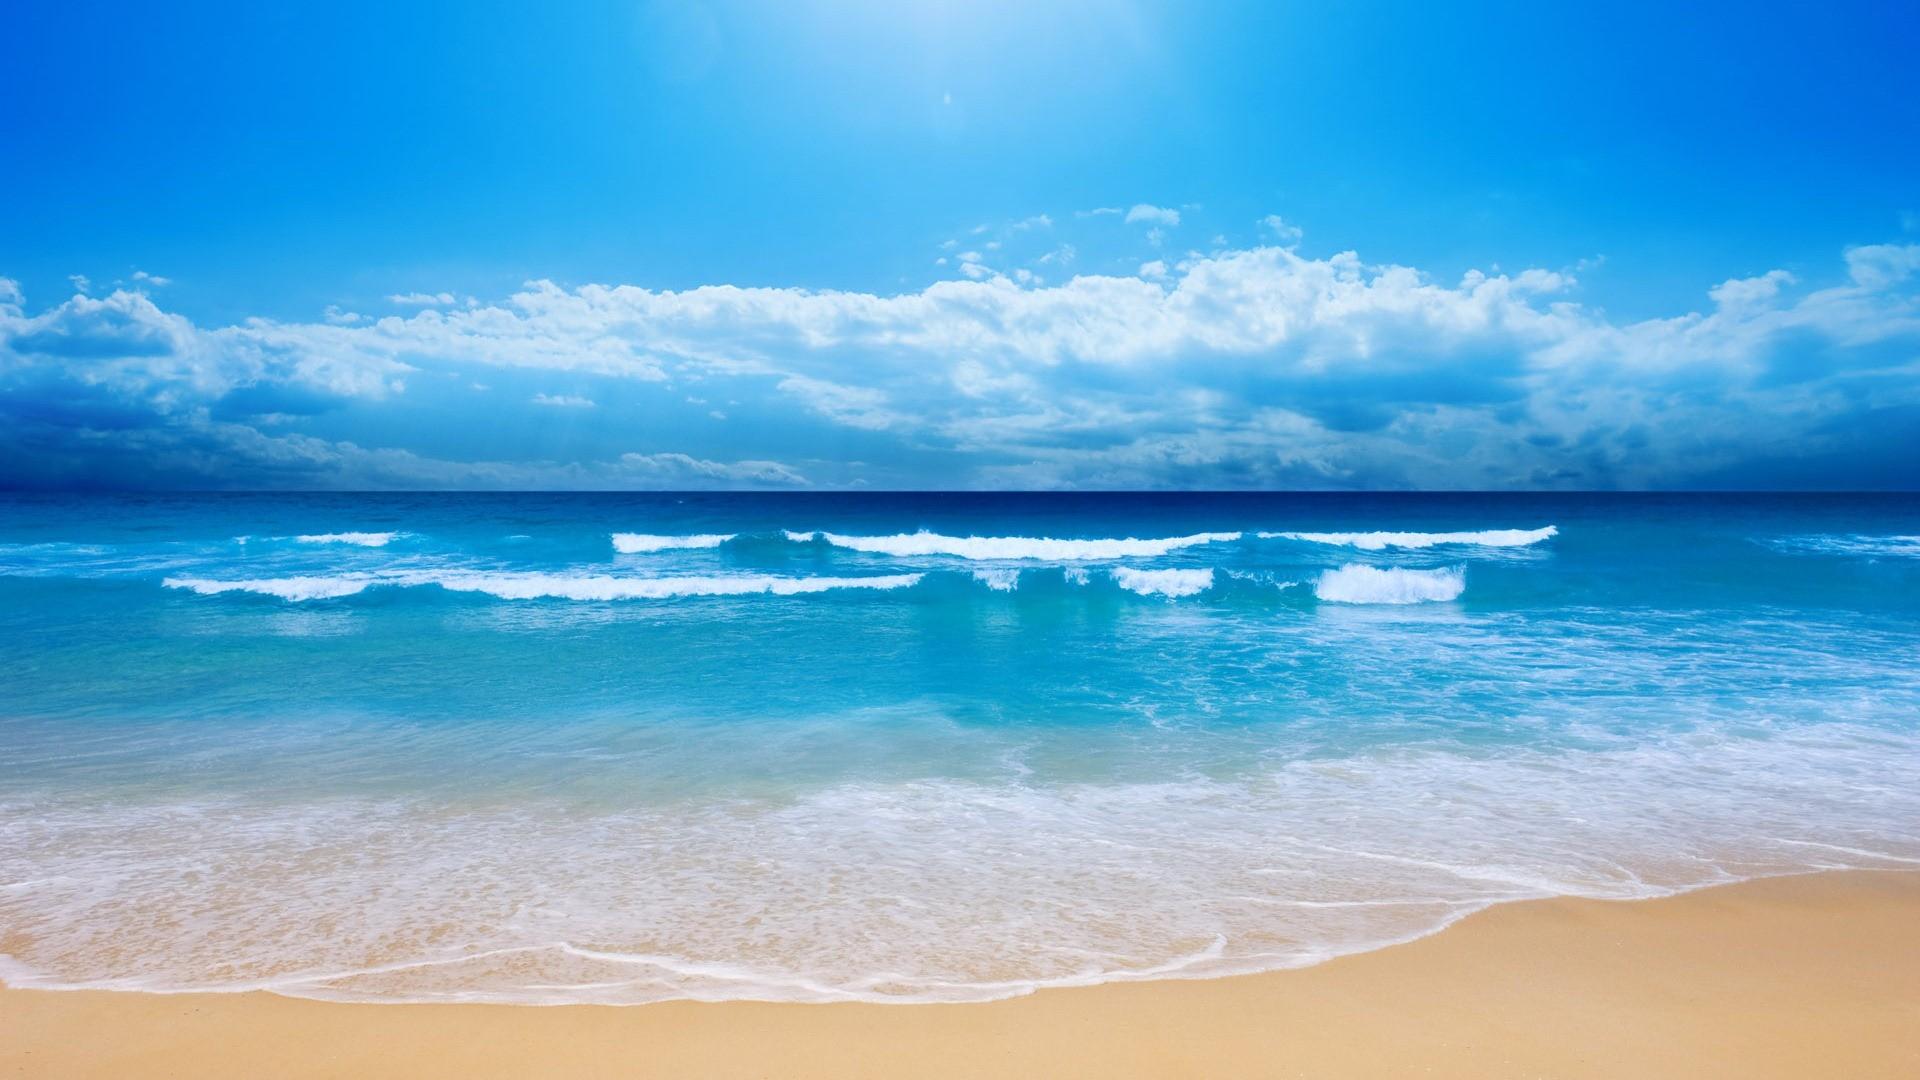 Tumblr Beach Backgrounds